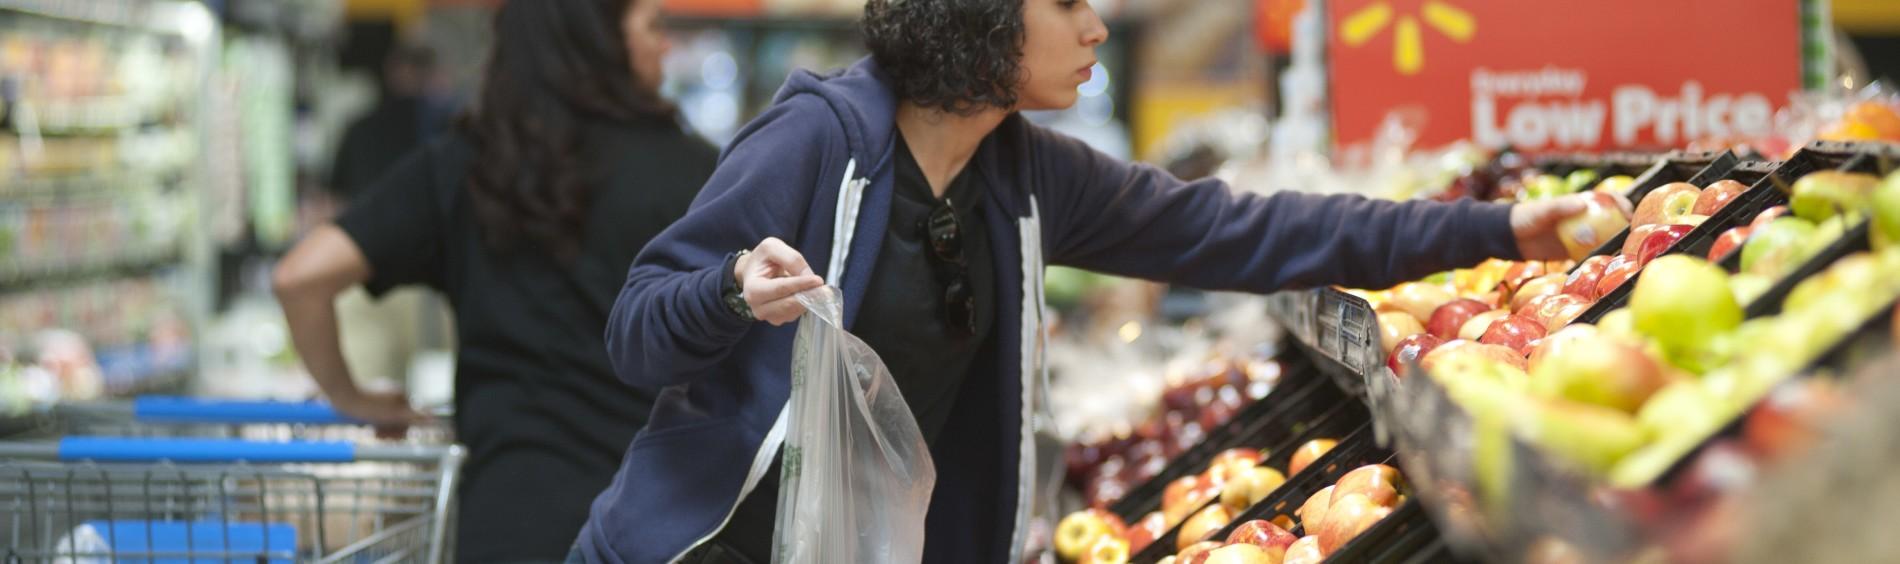 A Walmart customer shops for fresh produce